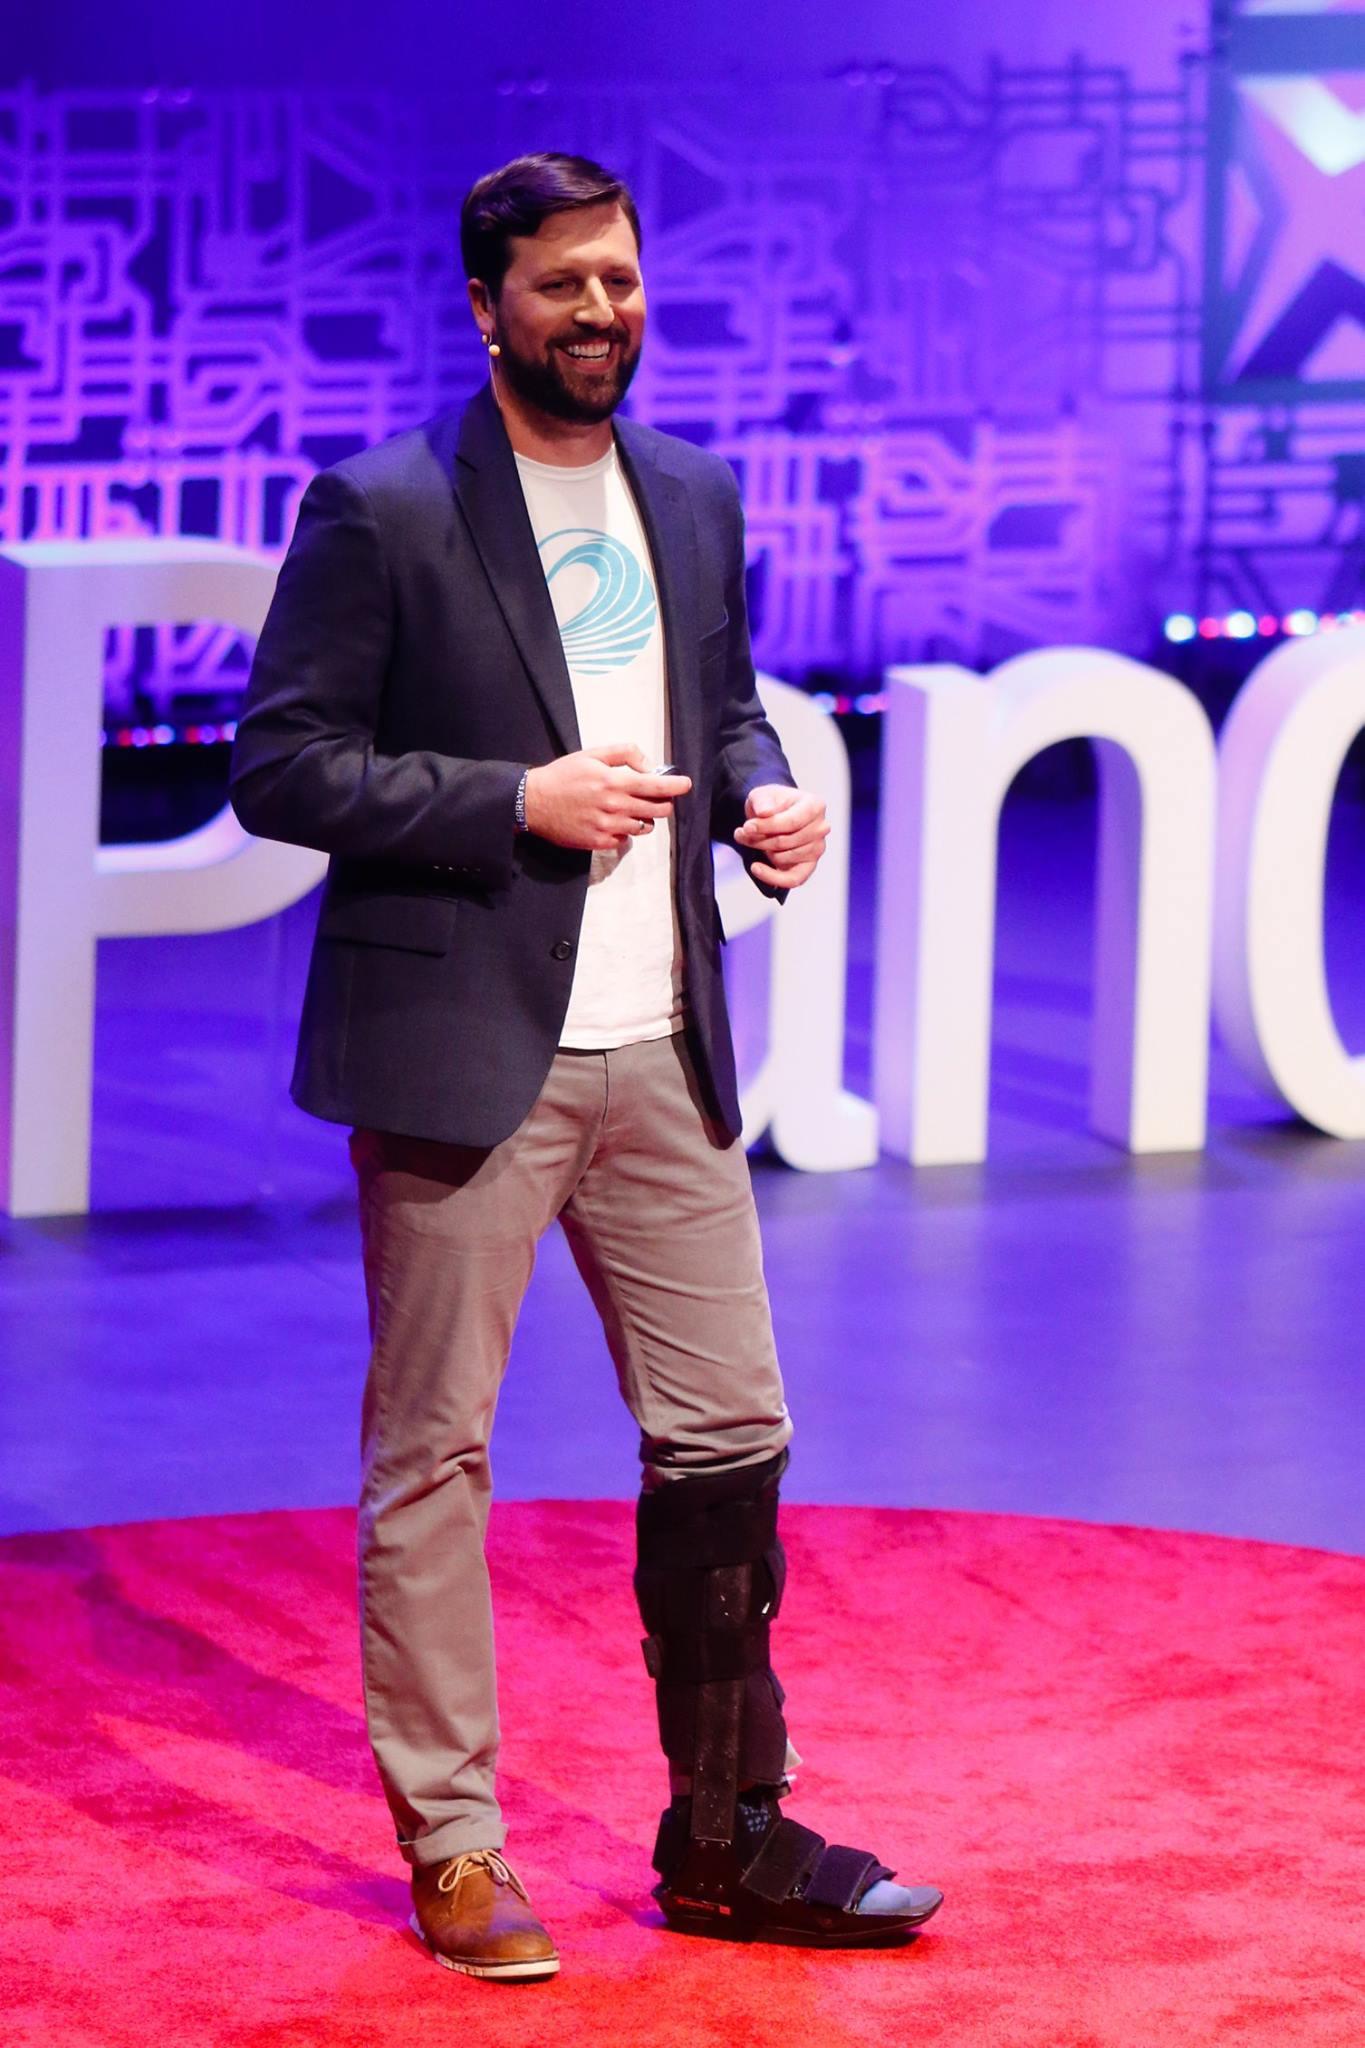 Ted Talk @ TedxPlano 2017